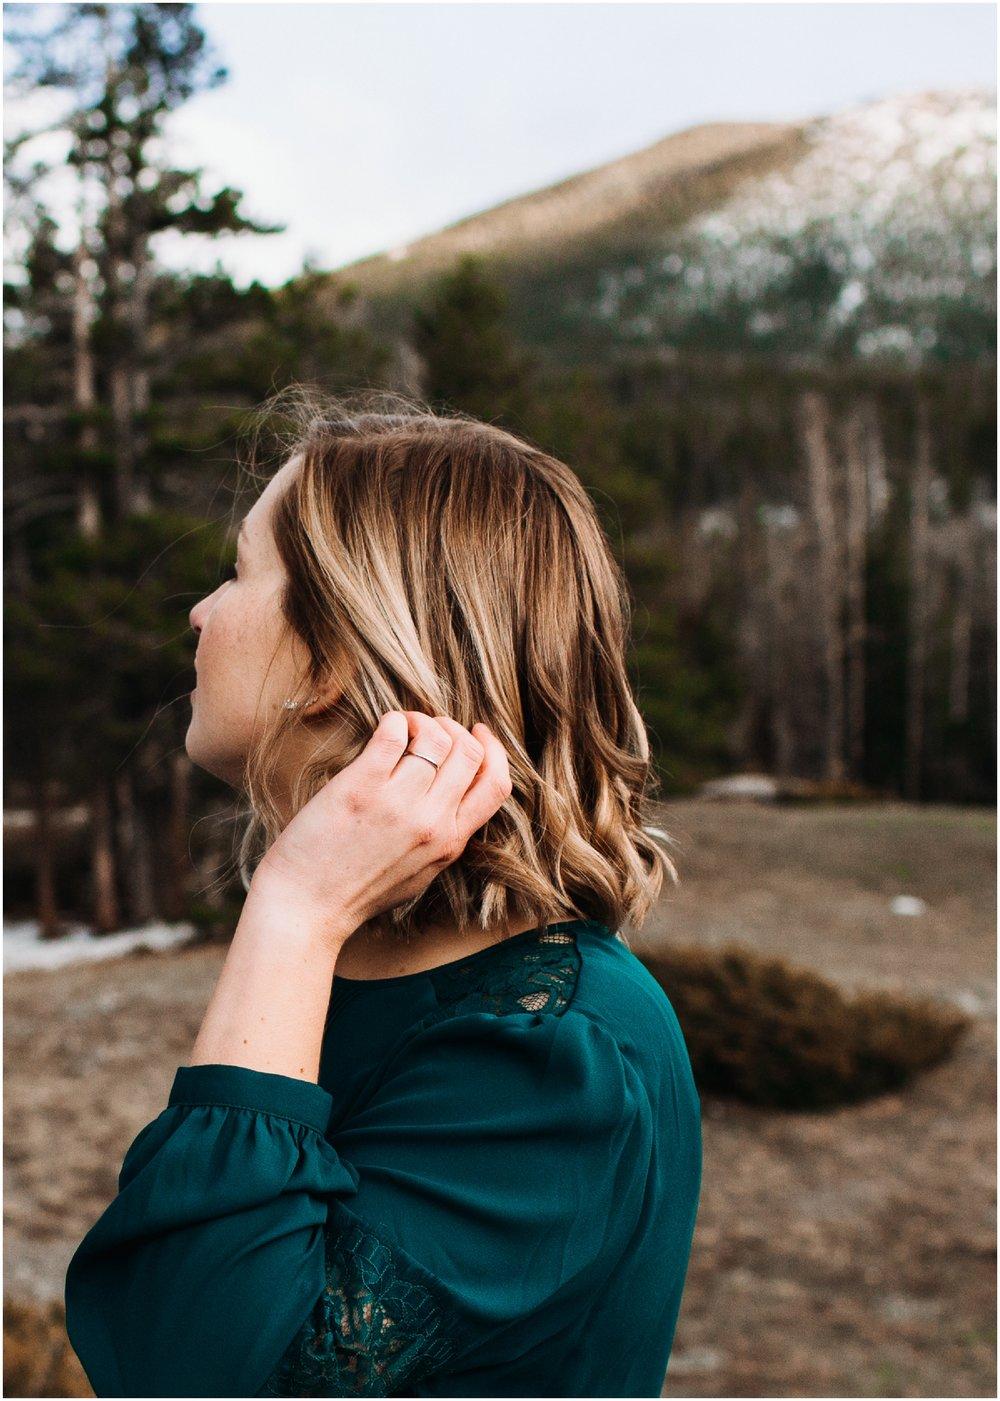 rocky-mountain-national-park-elopement-sprague-lake-colorado-adventure-wedding-photographer_taylor-powers_148.jpg